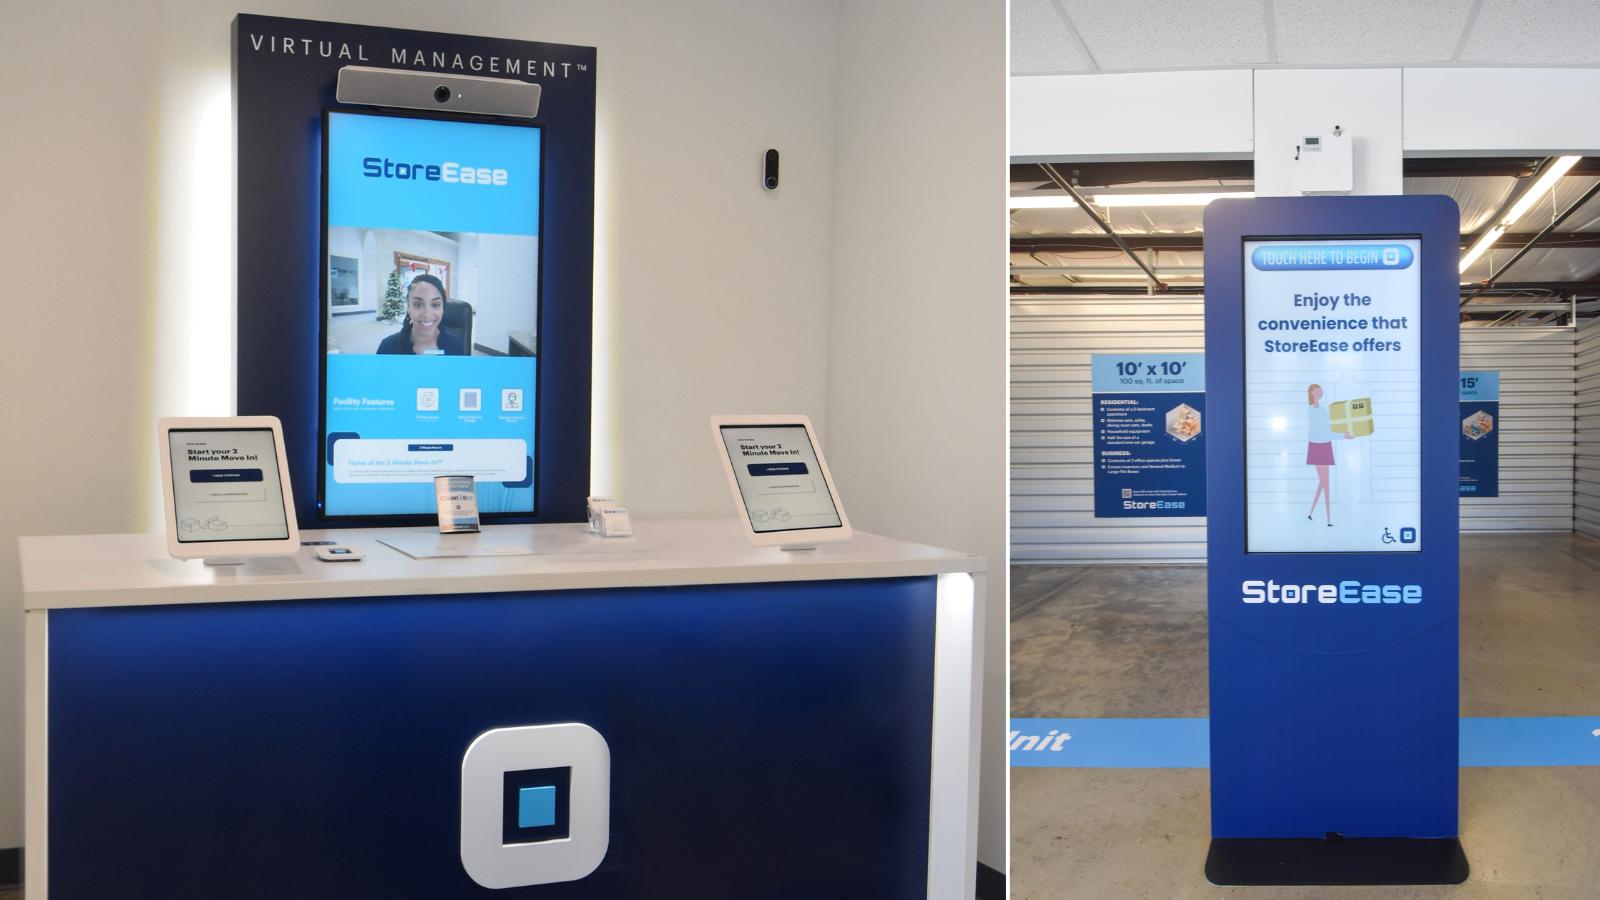 Virtual Manager and Self Service Kiosks at StoreEase Fultondale, AL